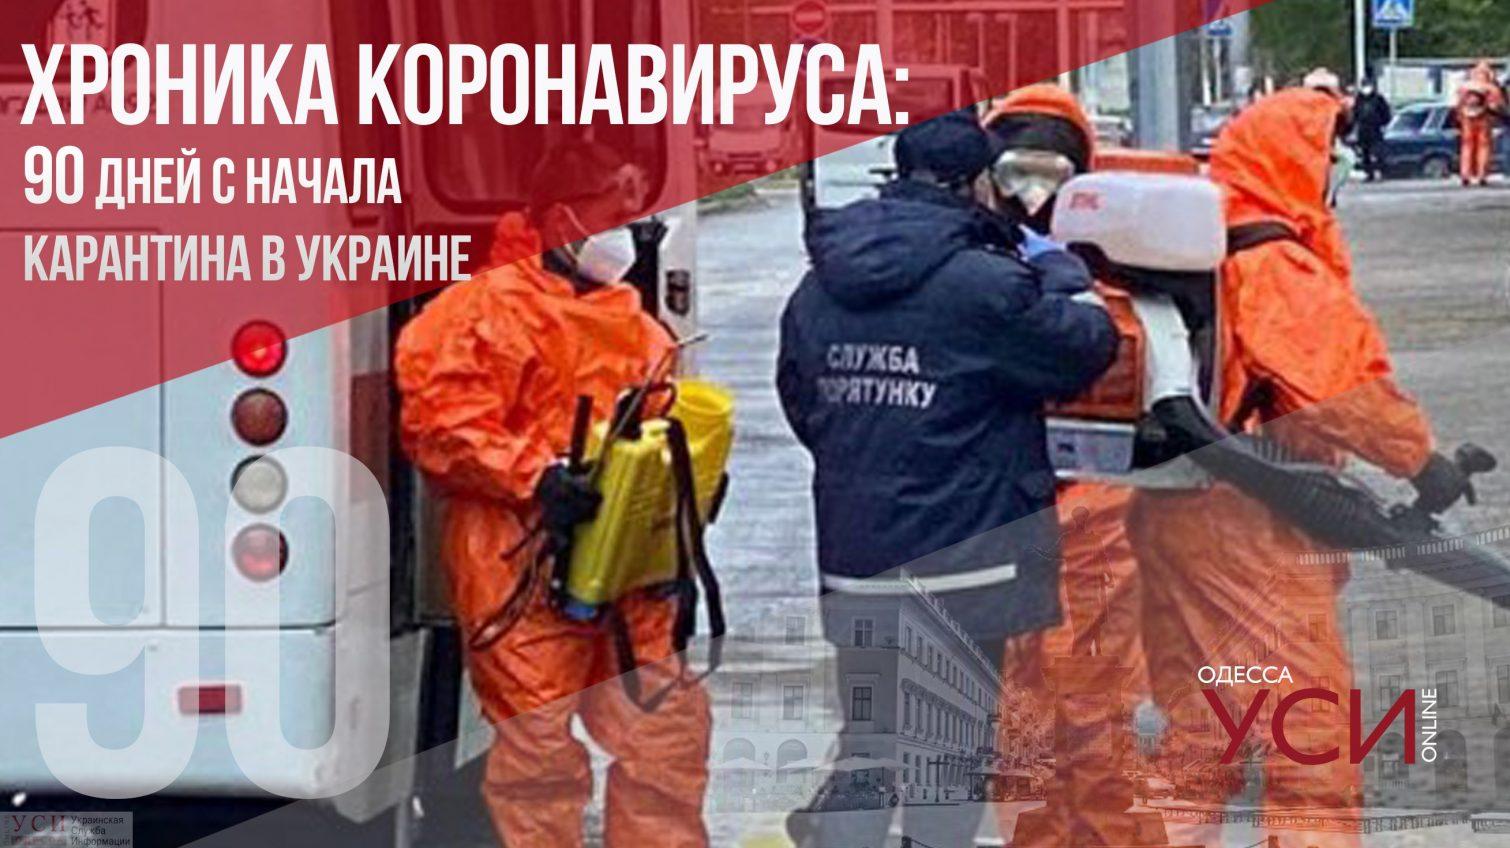 Хроника коронавируса: 90 дней карантина в Украине ОБНОВЛЯЕТСЯ «фото»